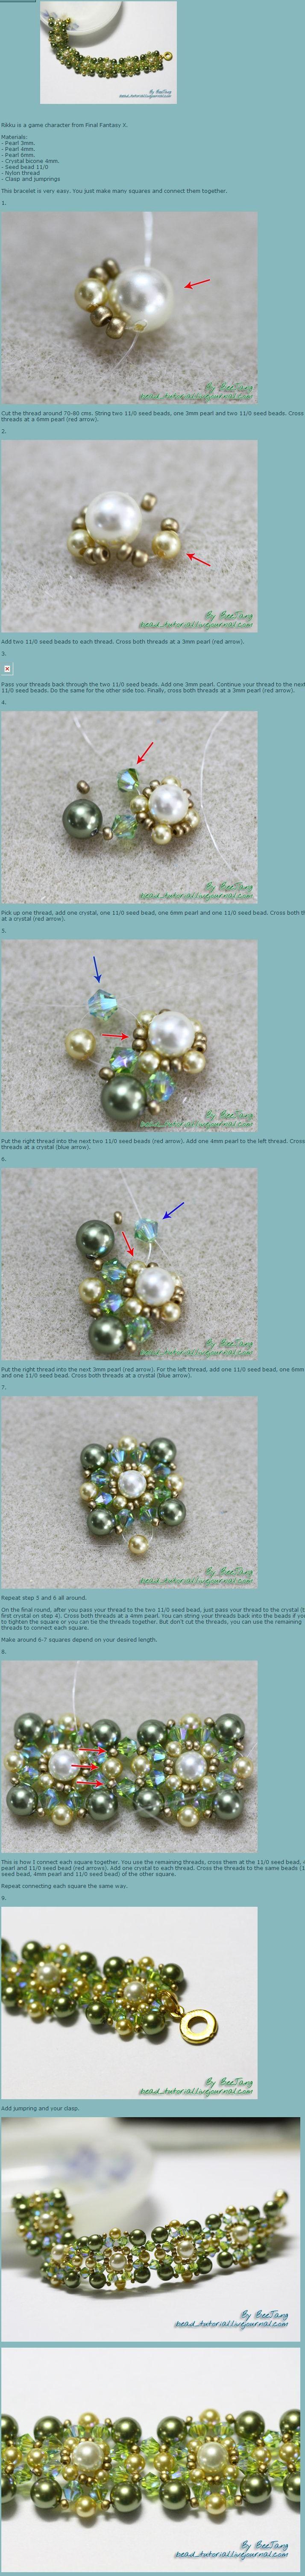 DIY - Bracelet free beading tutorial.